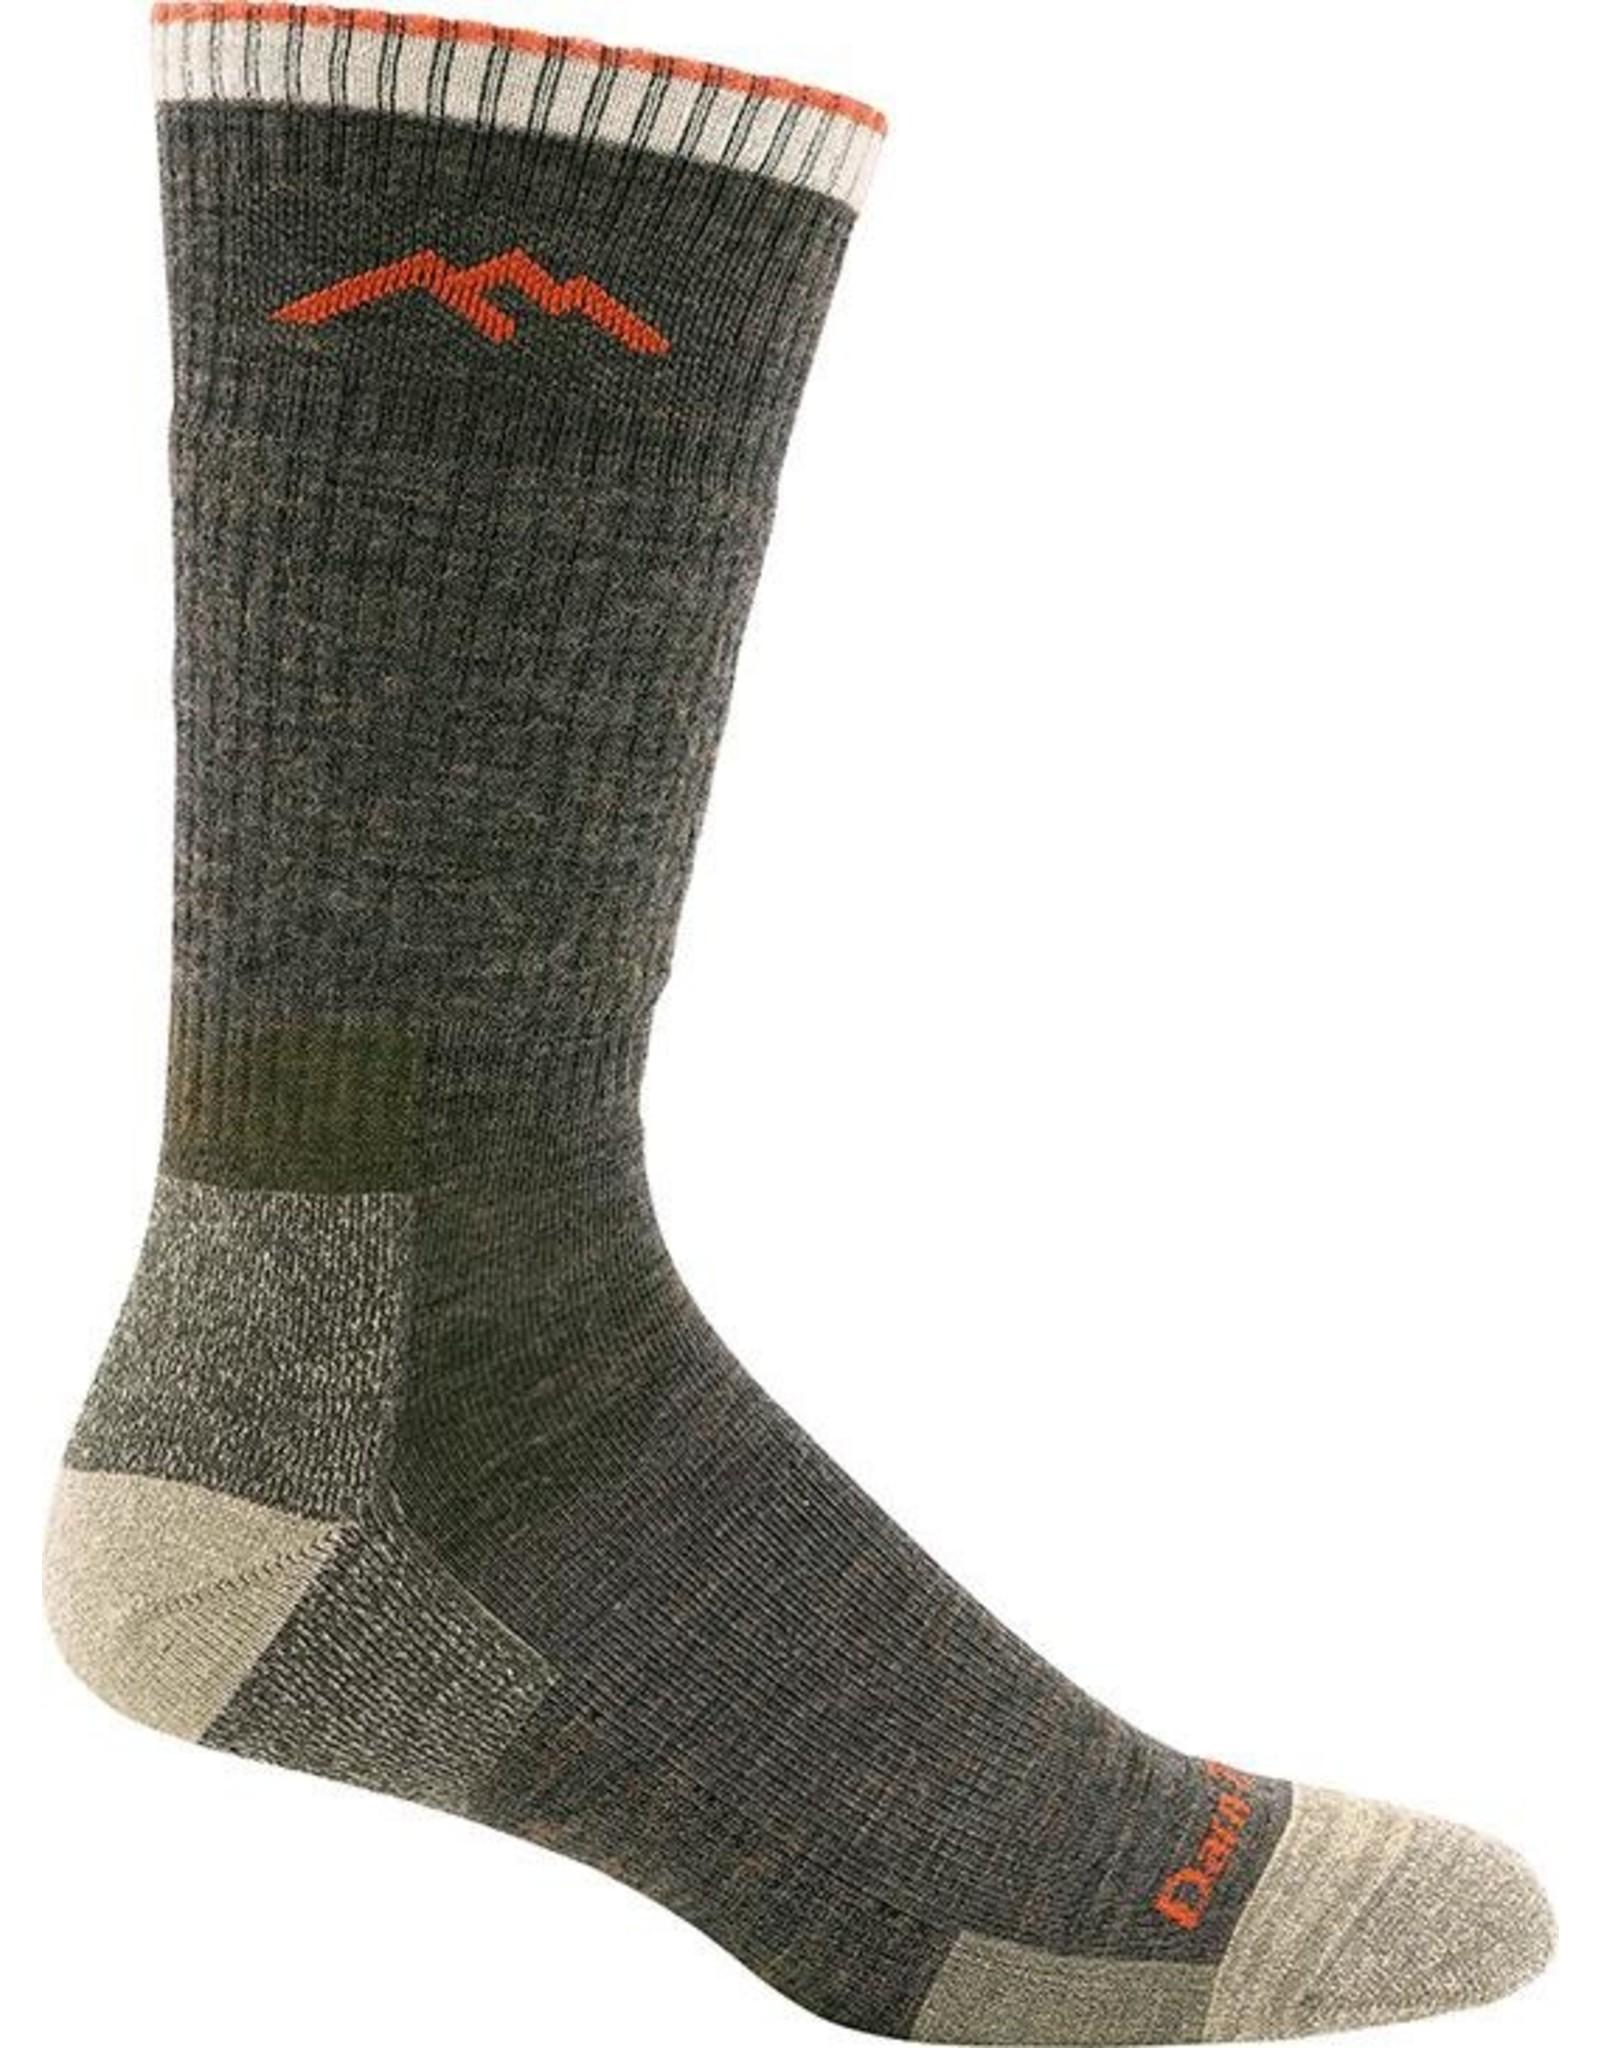 Darn Tough Hiker Boot Sock